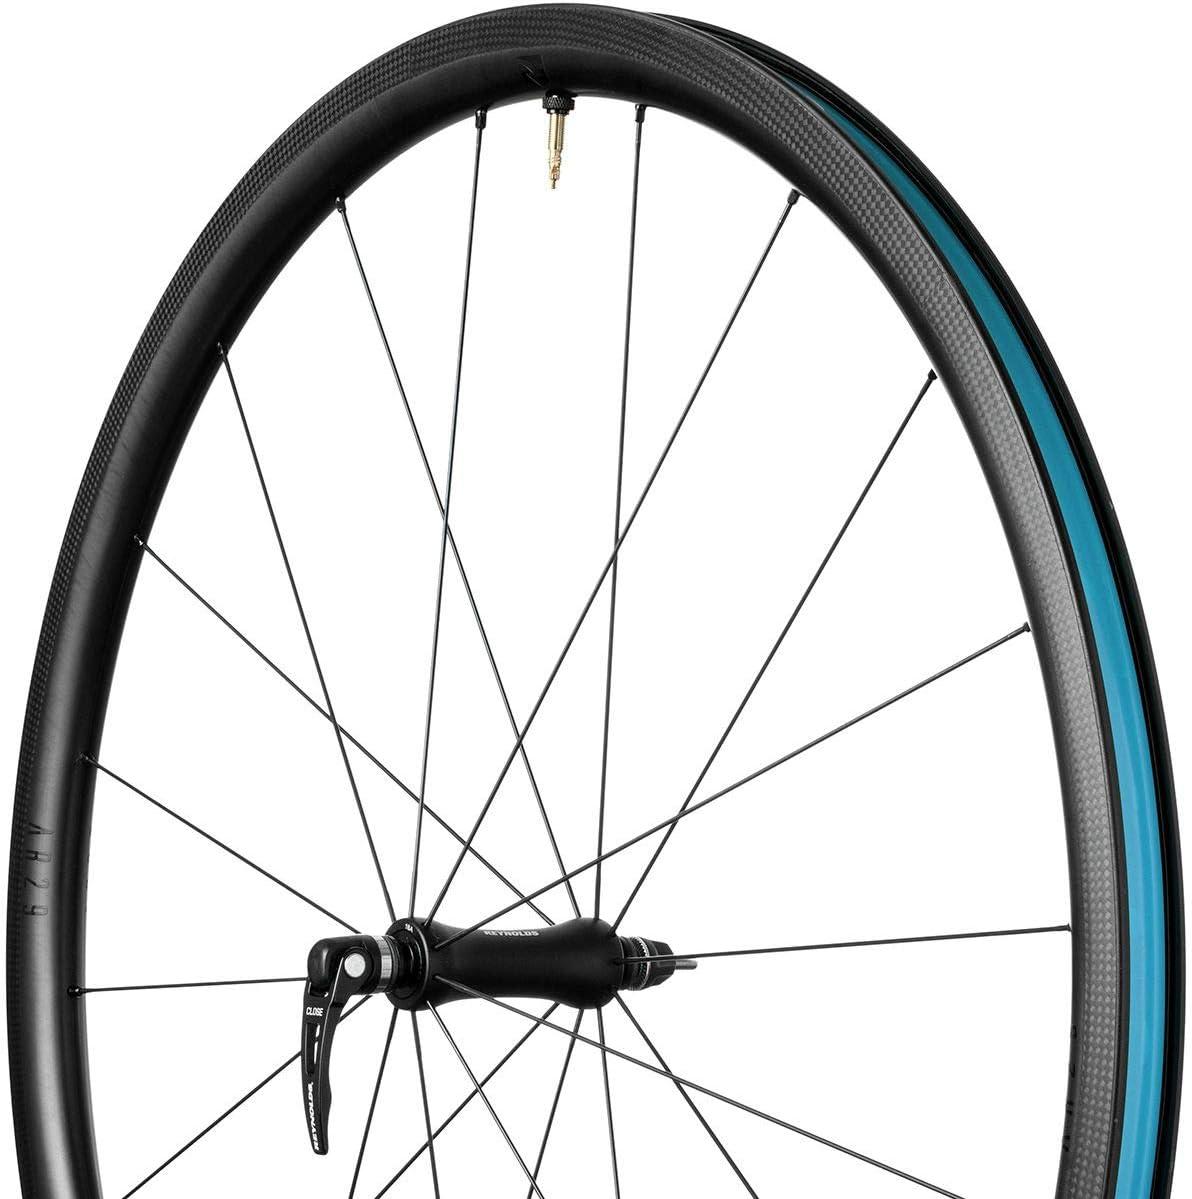 Reynolds AR29 Carbon Wheelset - Tubeless Black, Shimano, 11 Speed